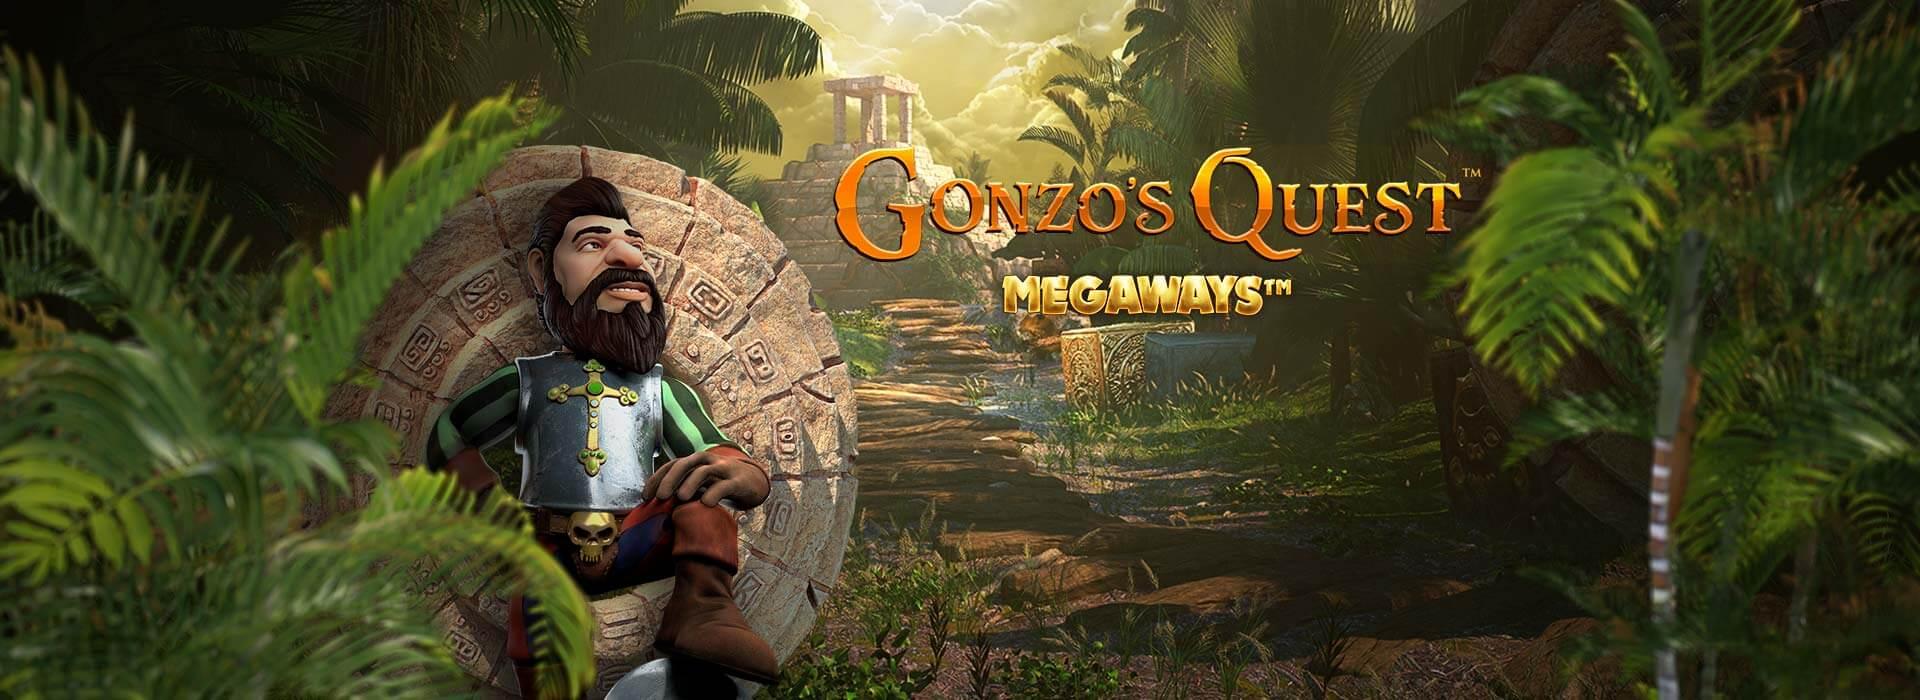 Red Tiger презентовал обновленную версию популярного слота Gonzo's Quest Megaways